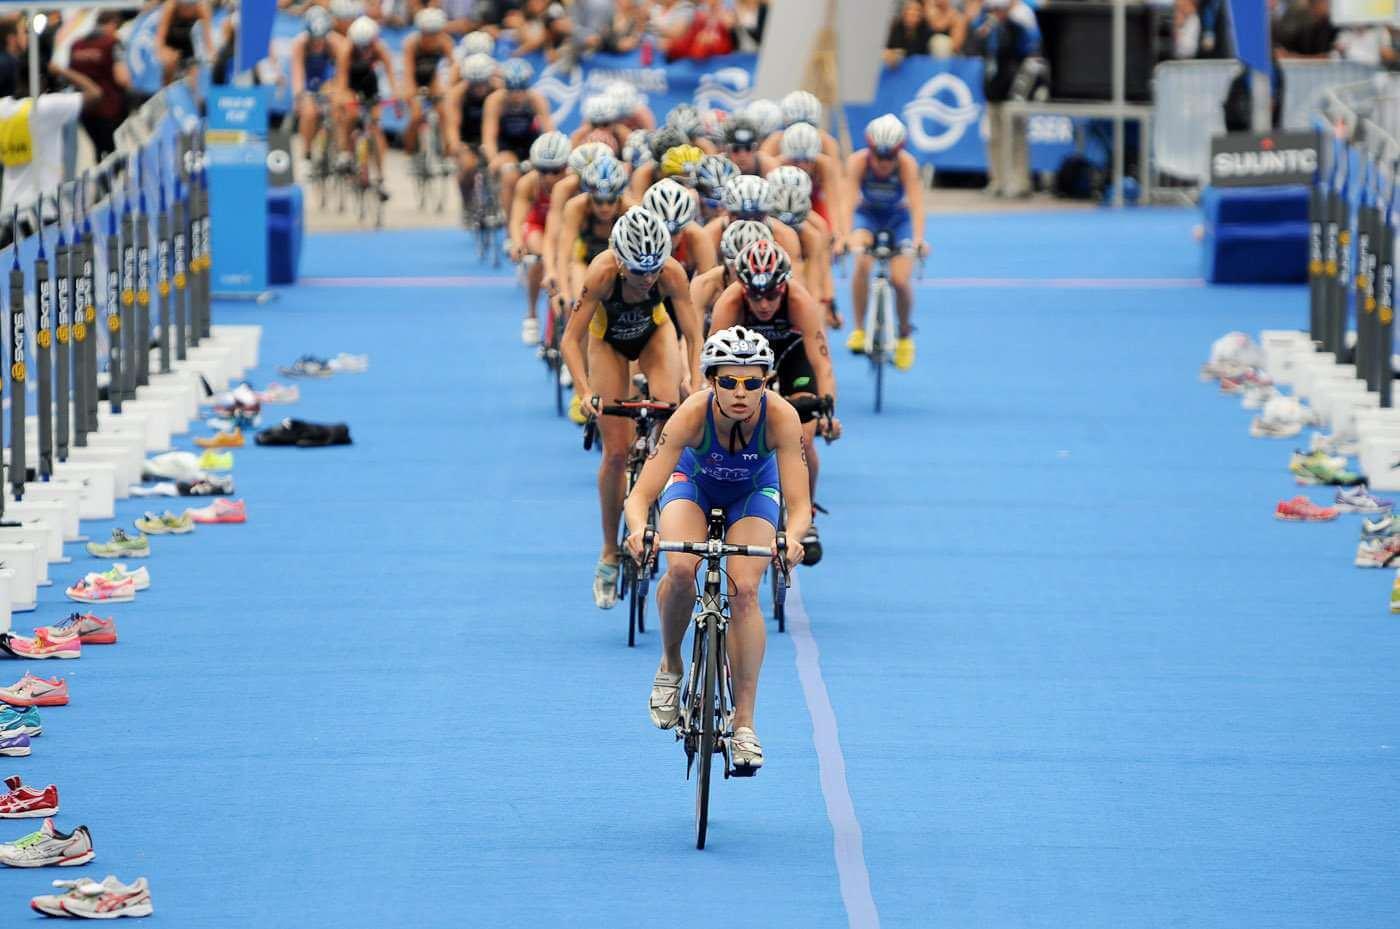 Triathlon cycling and running track